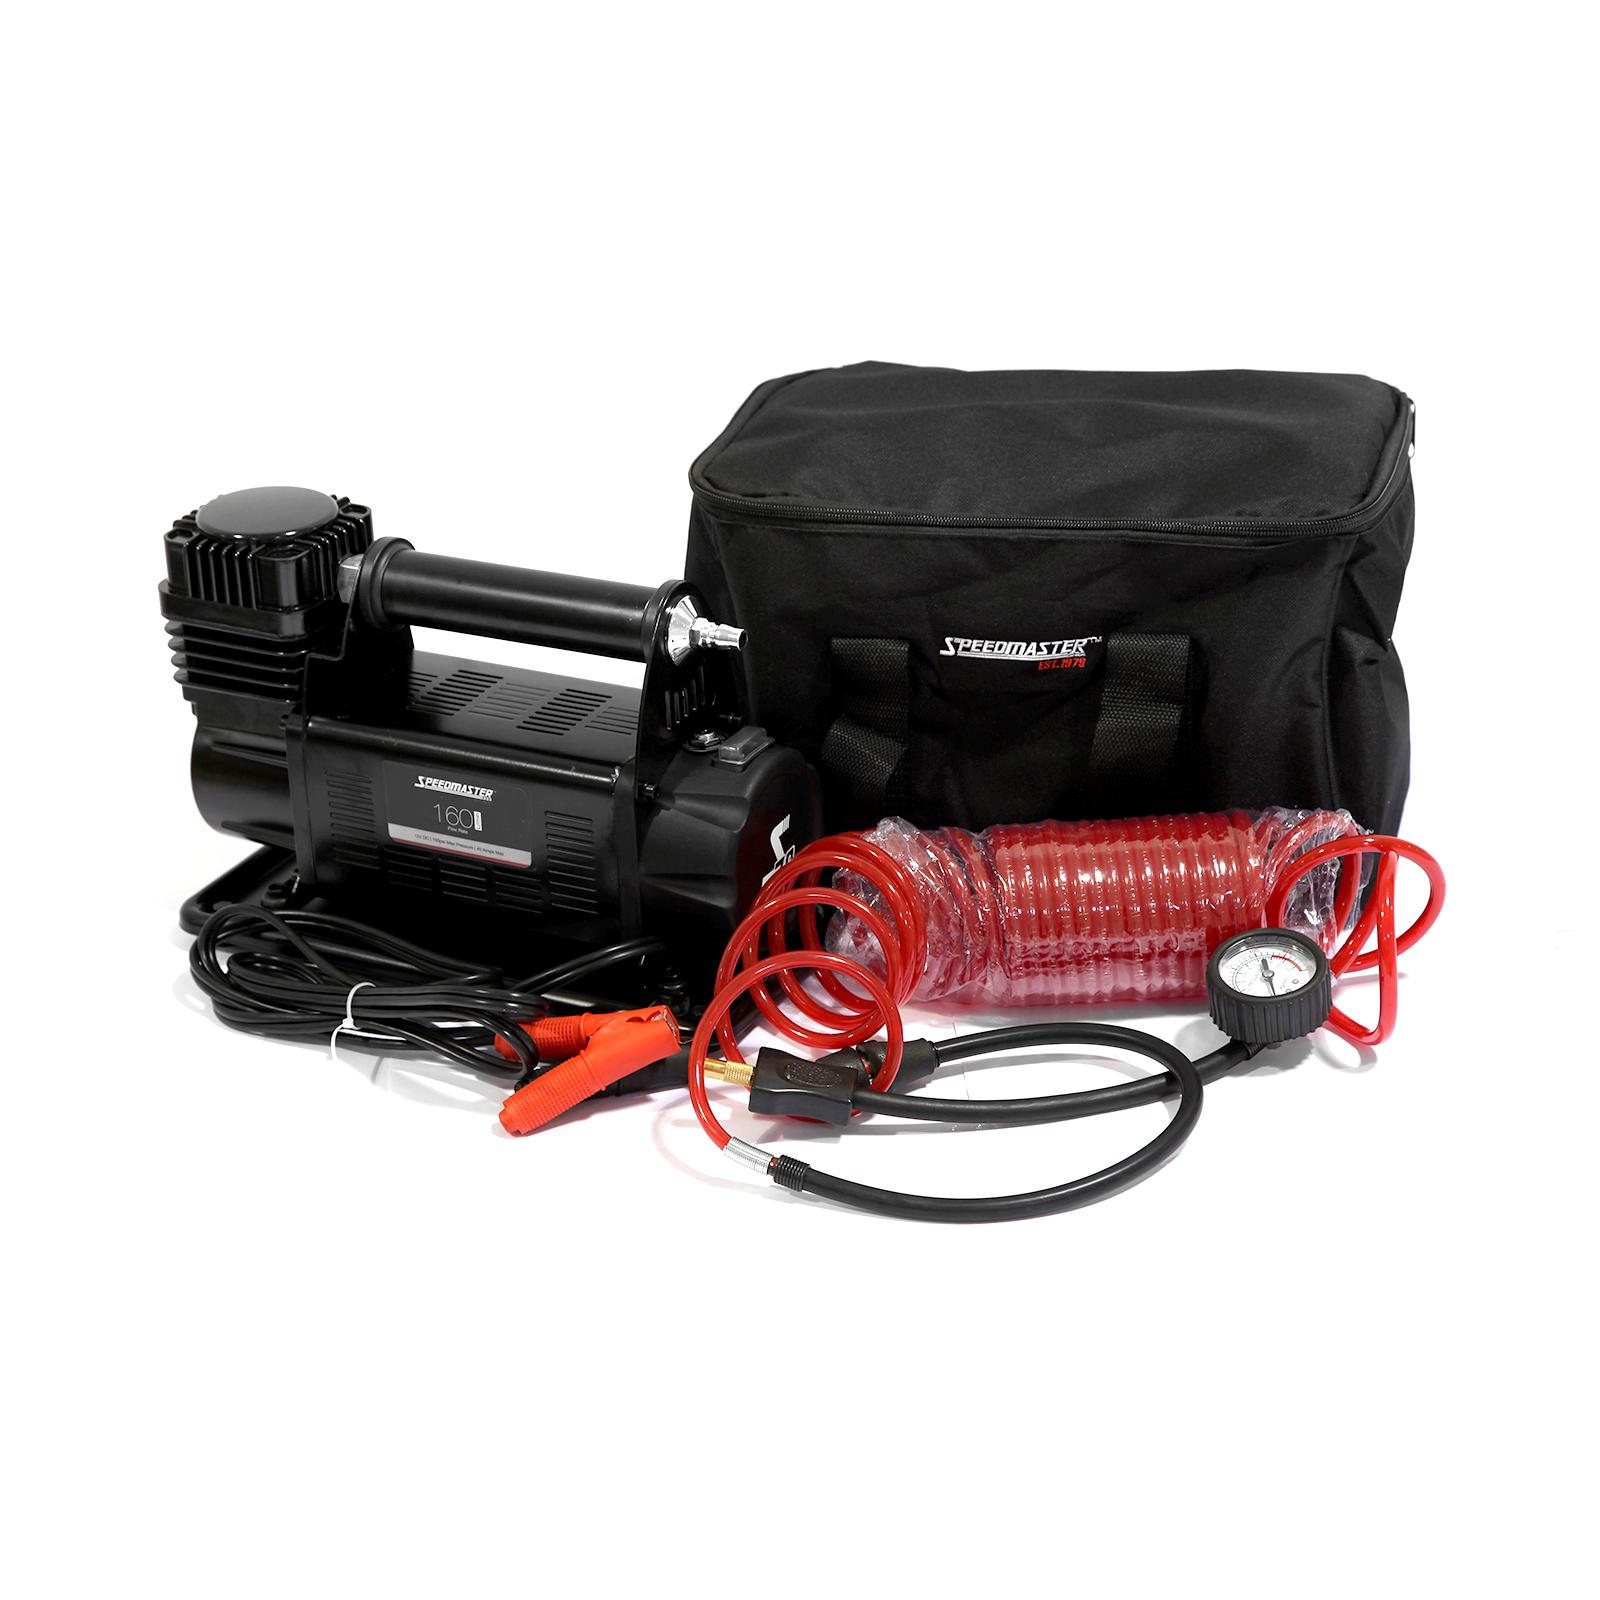 Speedmaster 12v Car Air Compressor 4x4 Tyre Deflator 4wd Portable Inflator 160L